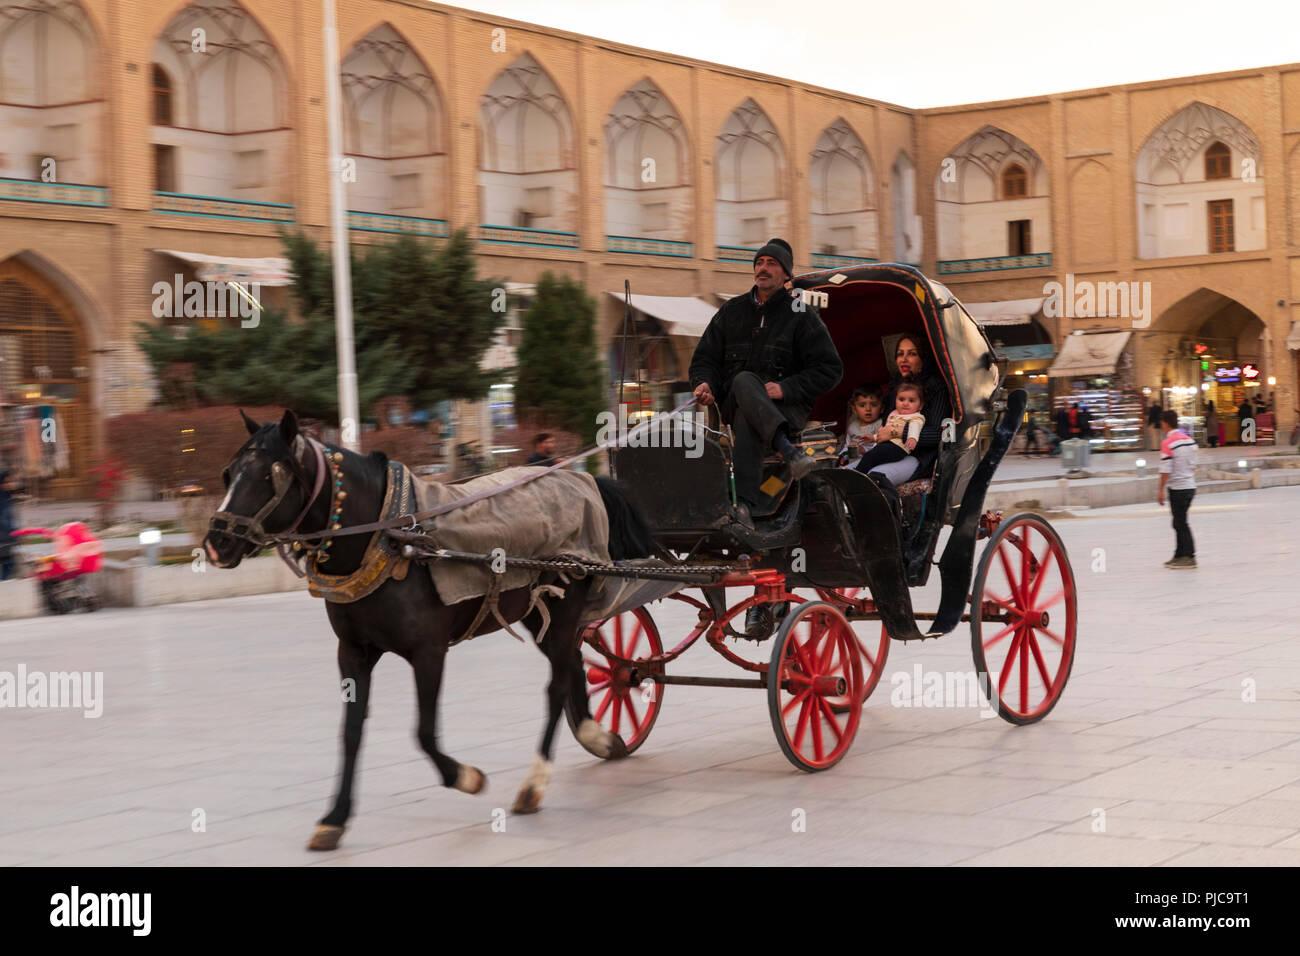 Islamic Republic of Iran  Isfahan  Shah or Imam, Emam Mosque